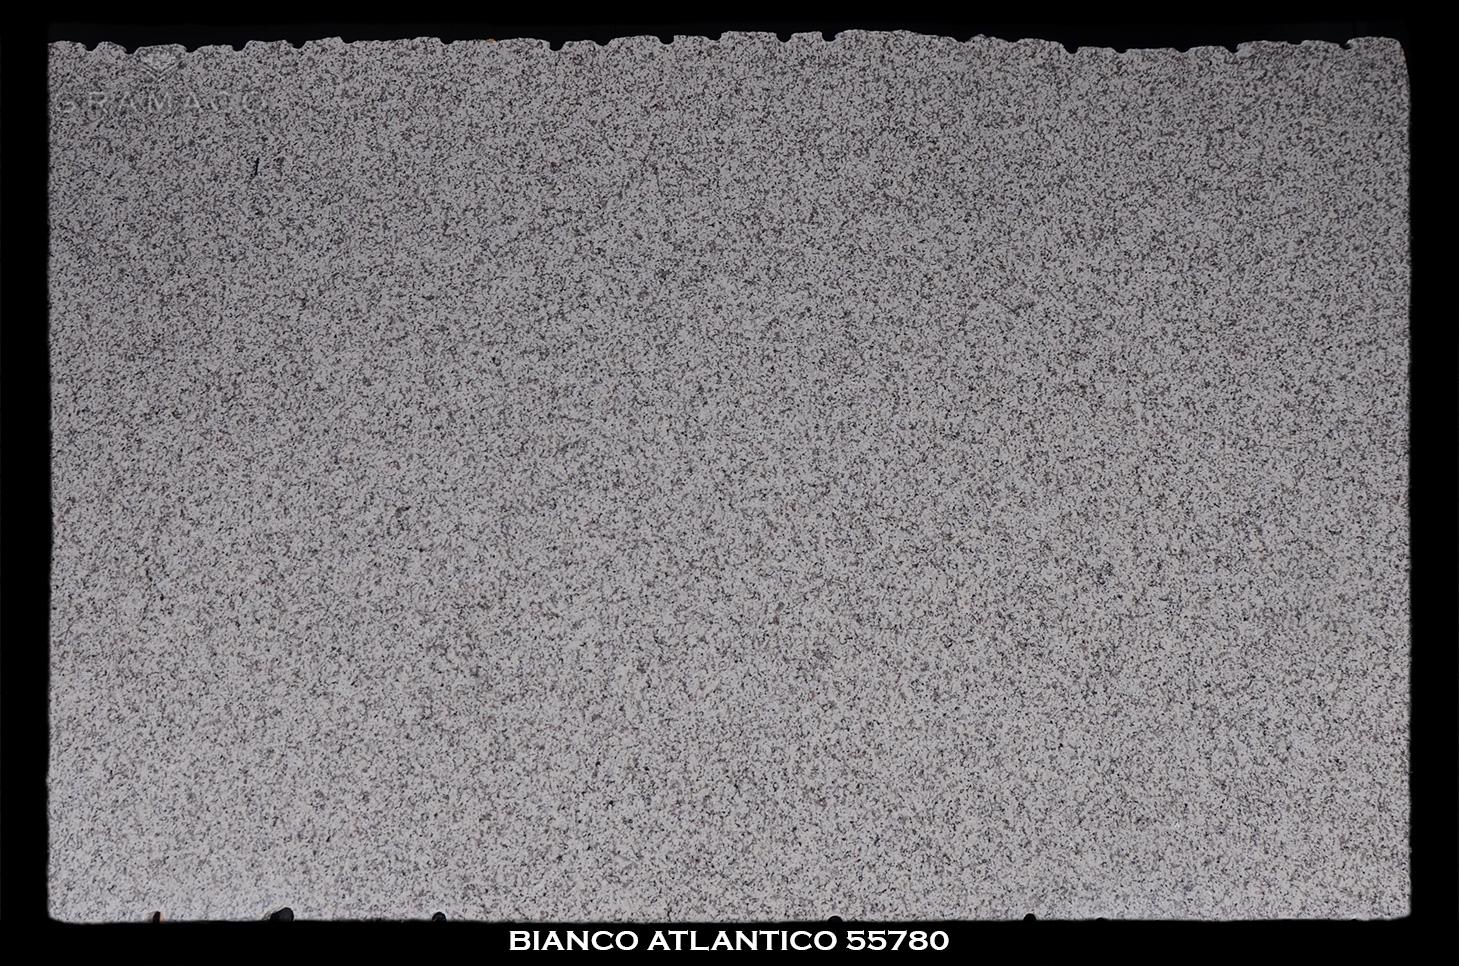 Bianco-Atlantico-55780-slab